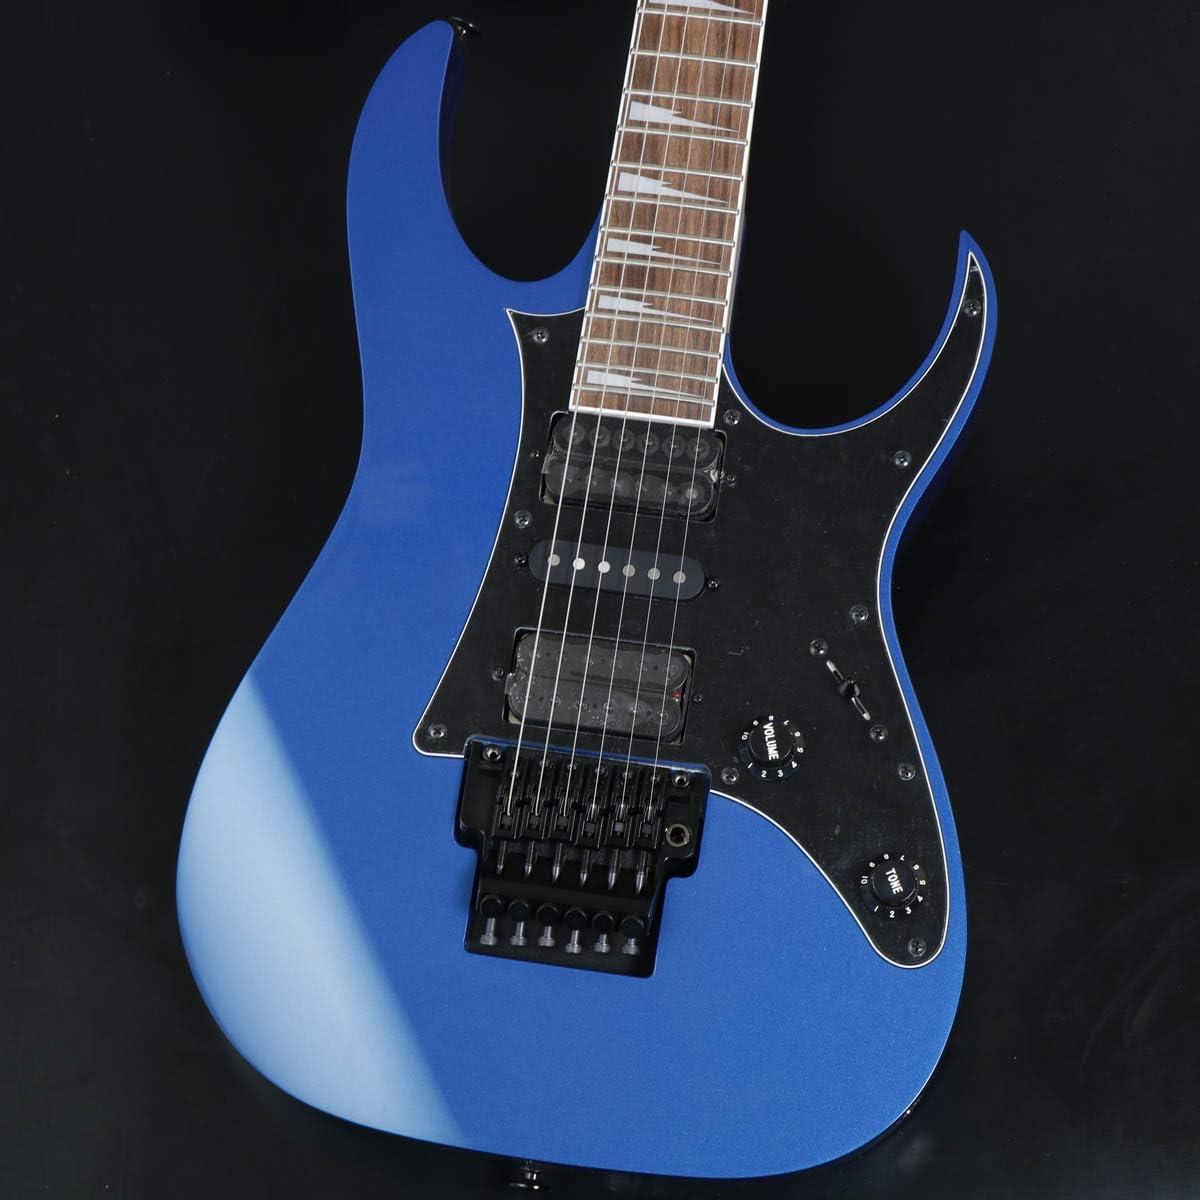 Ibanez Genesis Collection RG550DX - Laser Blue